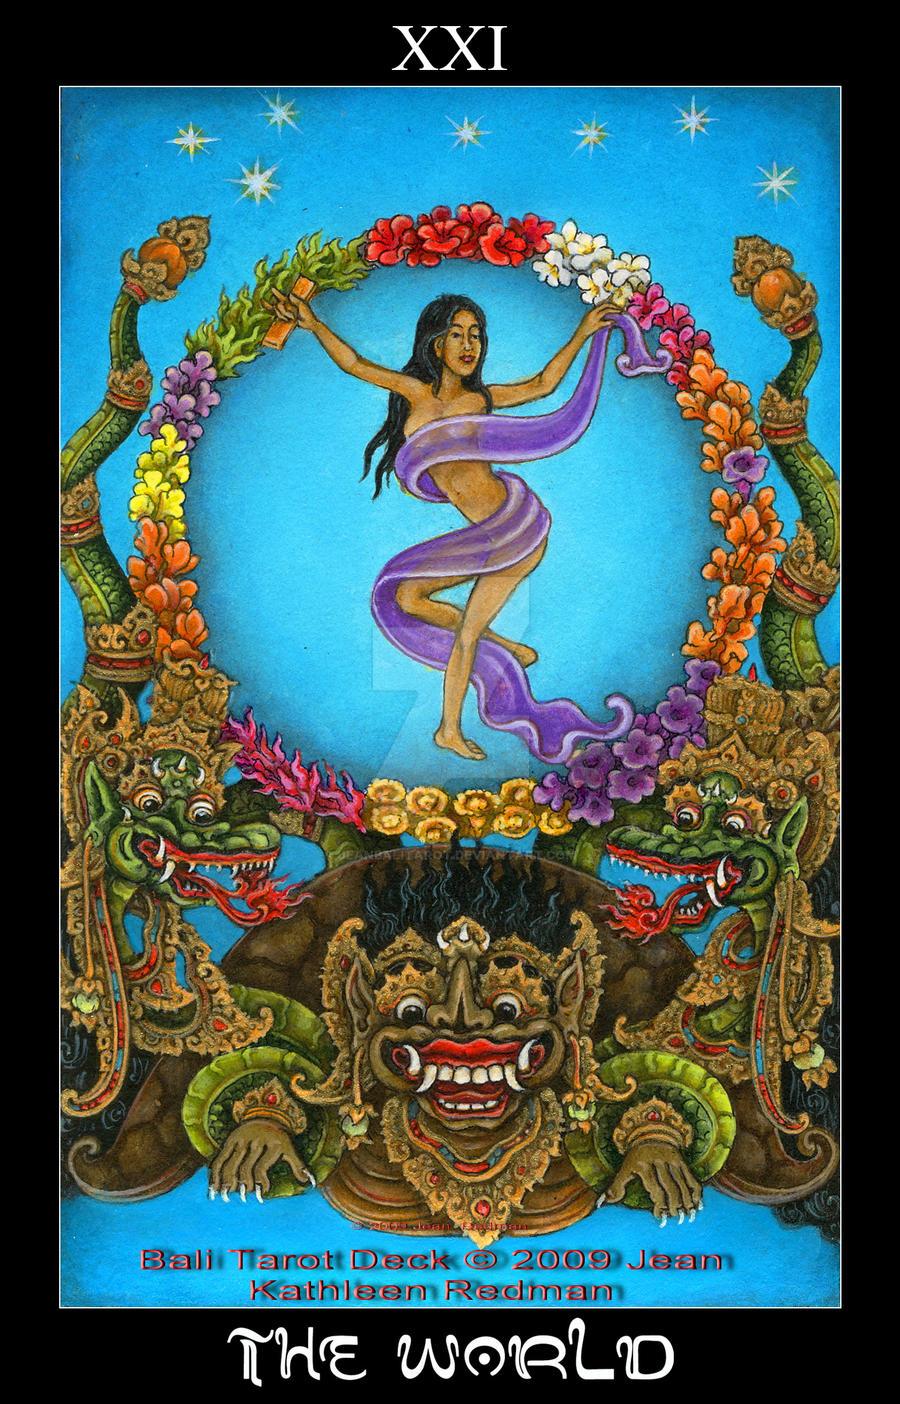 The World, Bali Tarot Deck By Jeanbalitarot On DeviantArt